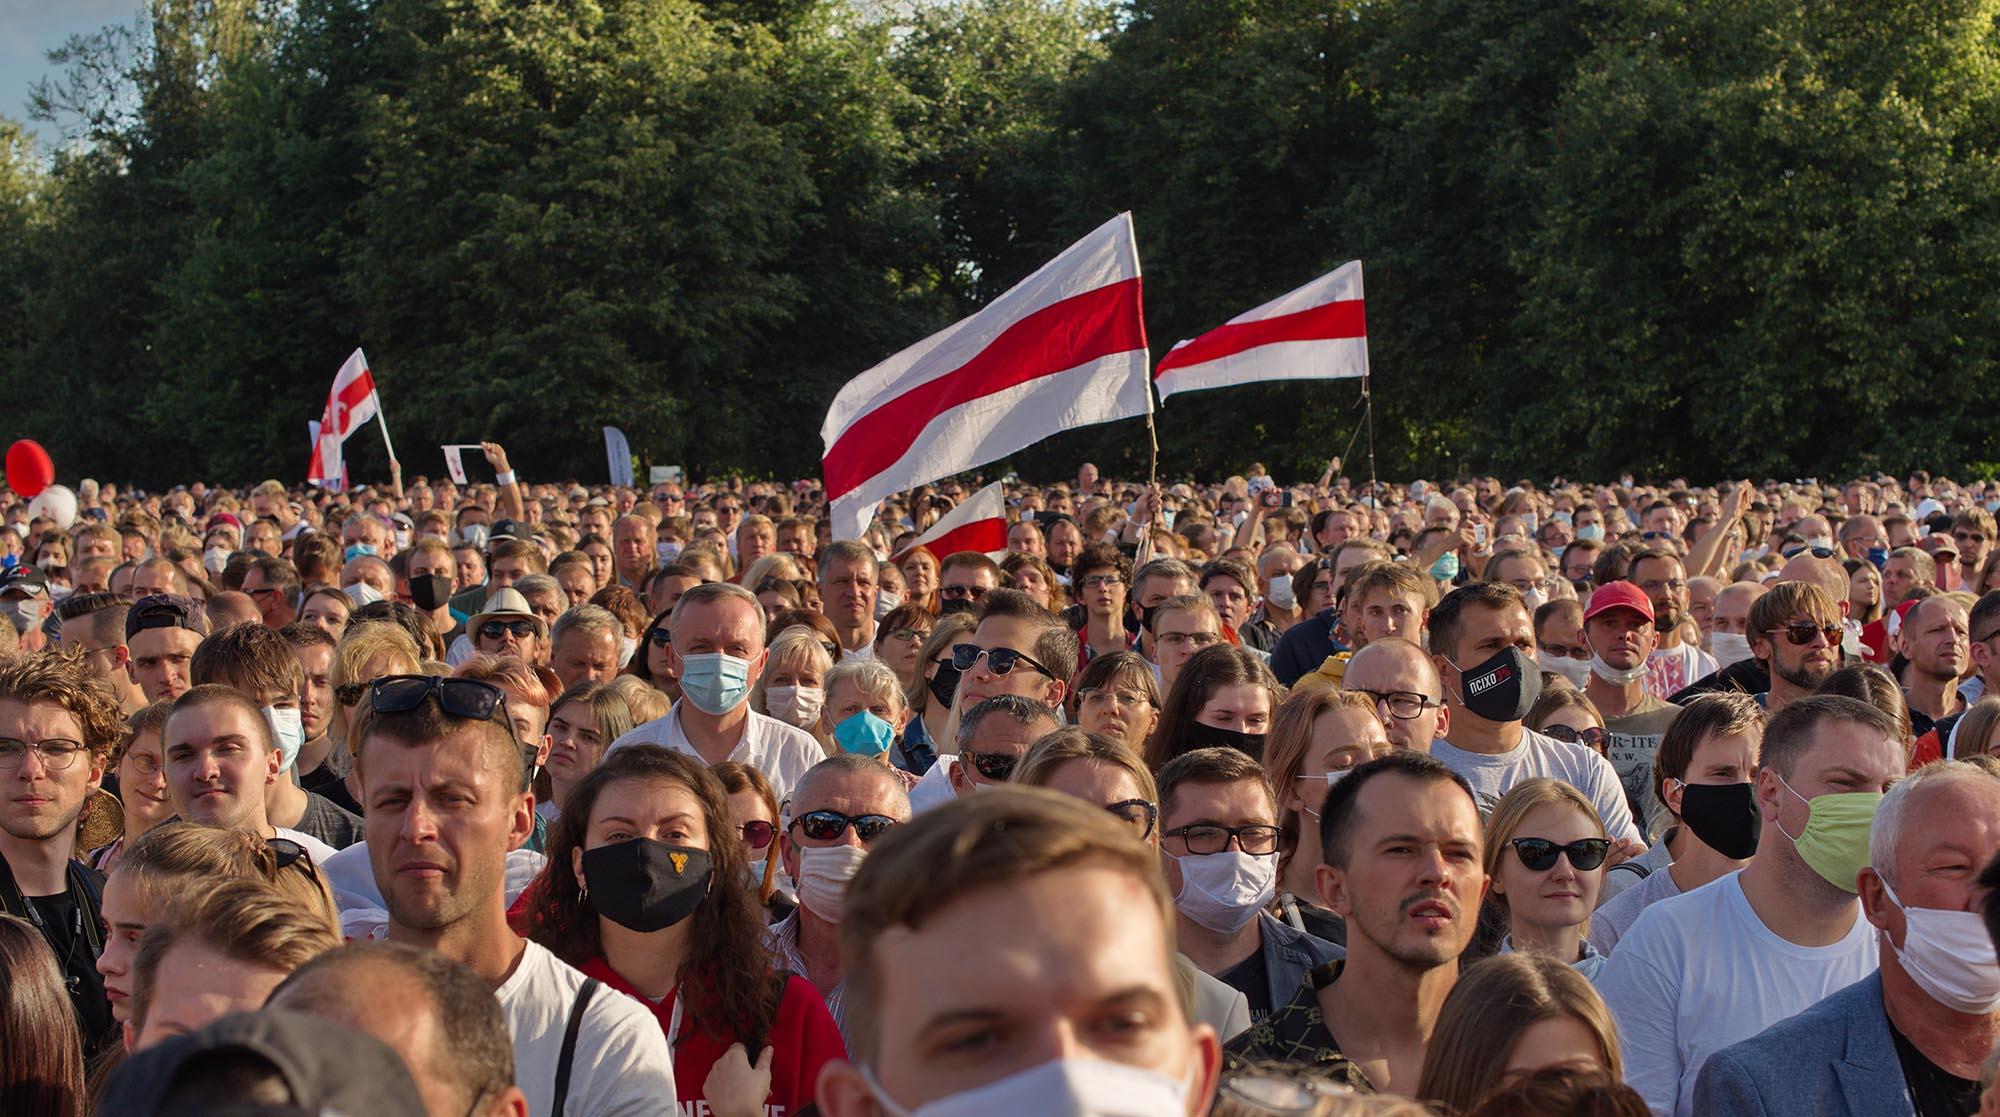 Belarusian people flocked to attend a pre-election rally for opposition candidate Svetlana Tikhanovskaya in Minsk in July 2020. Credit:  Svetlana Turchenick/Shutterstock.com.